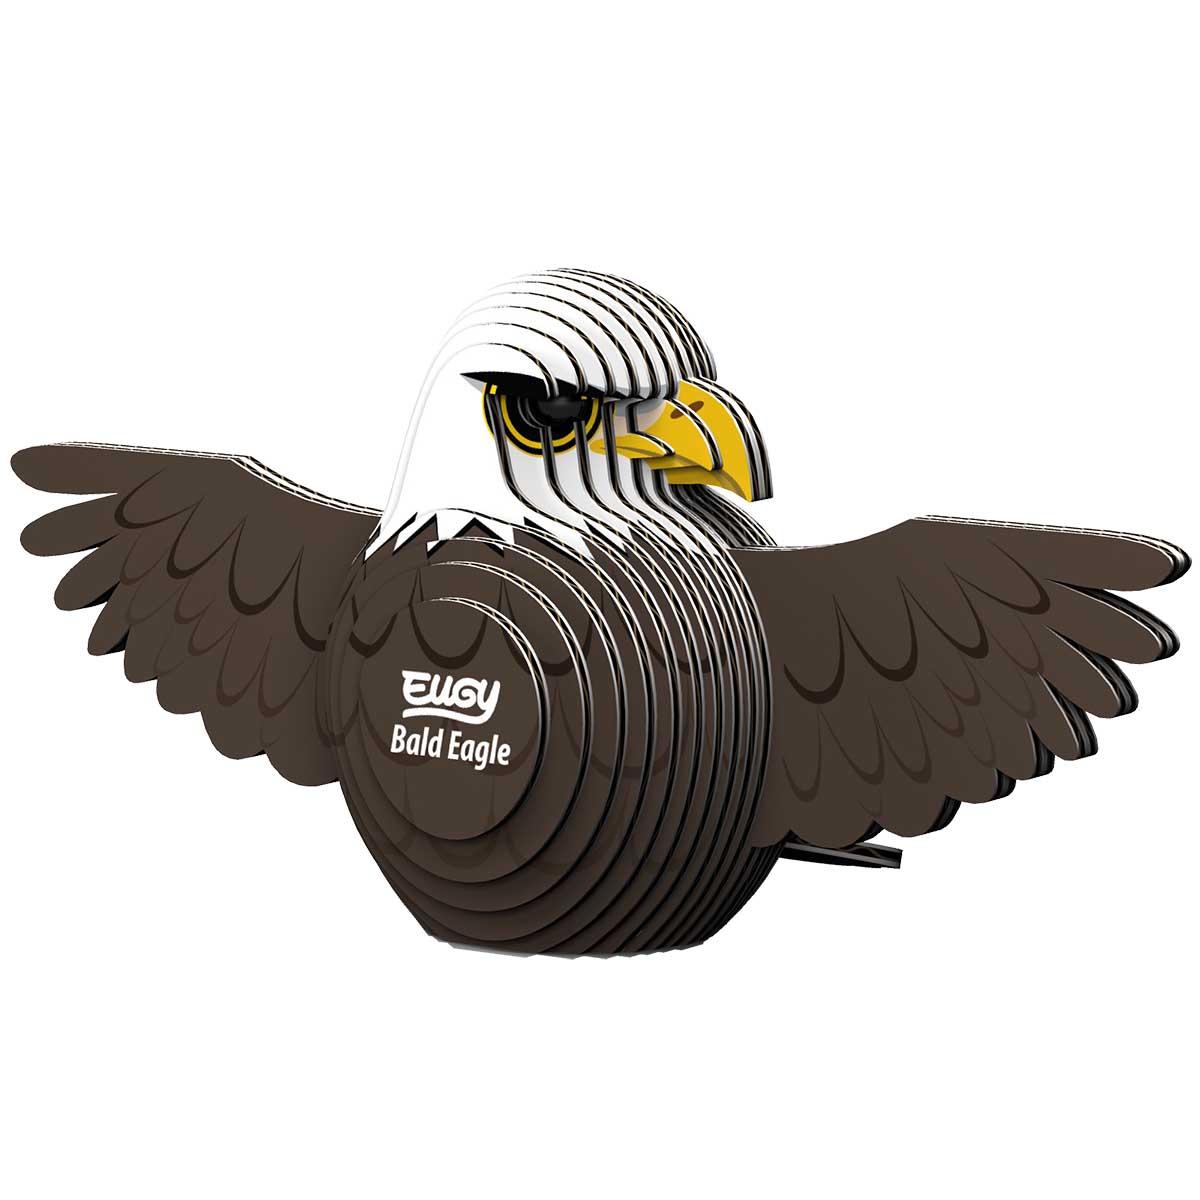 Bald Eagle Eugy Eagles 3D Puzzle